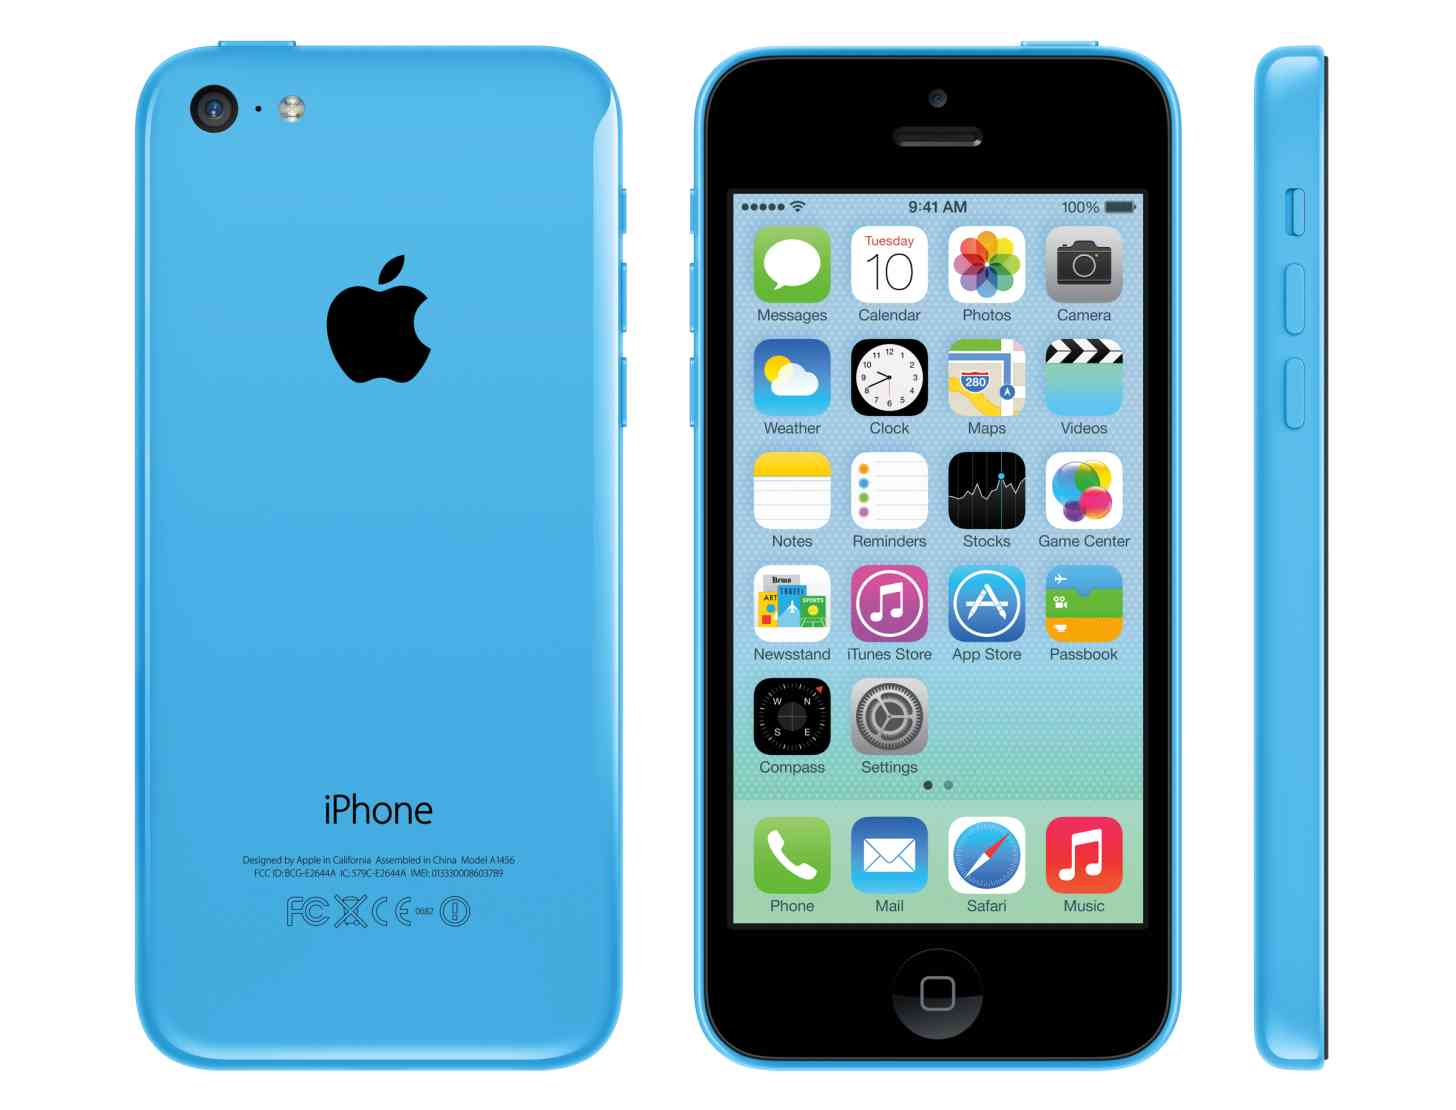 iPhone 5c blue large